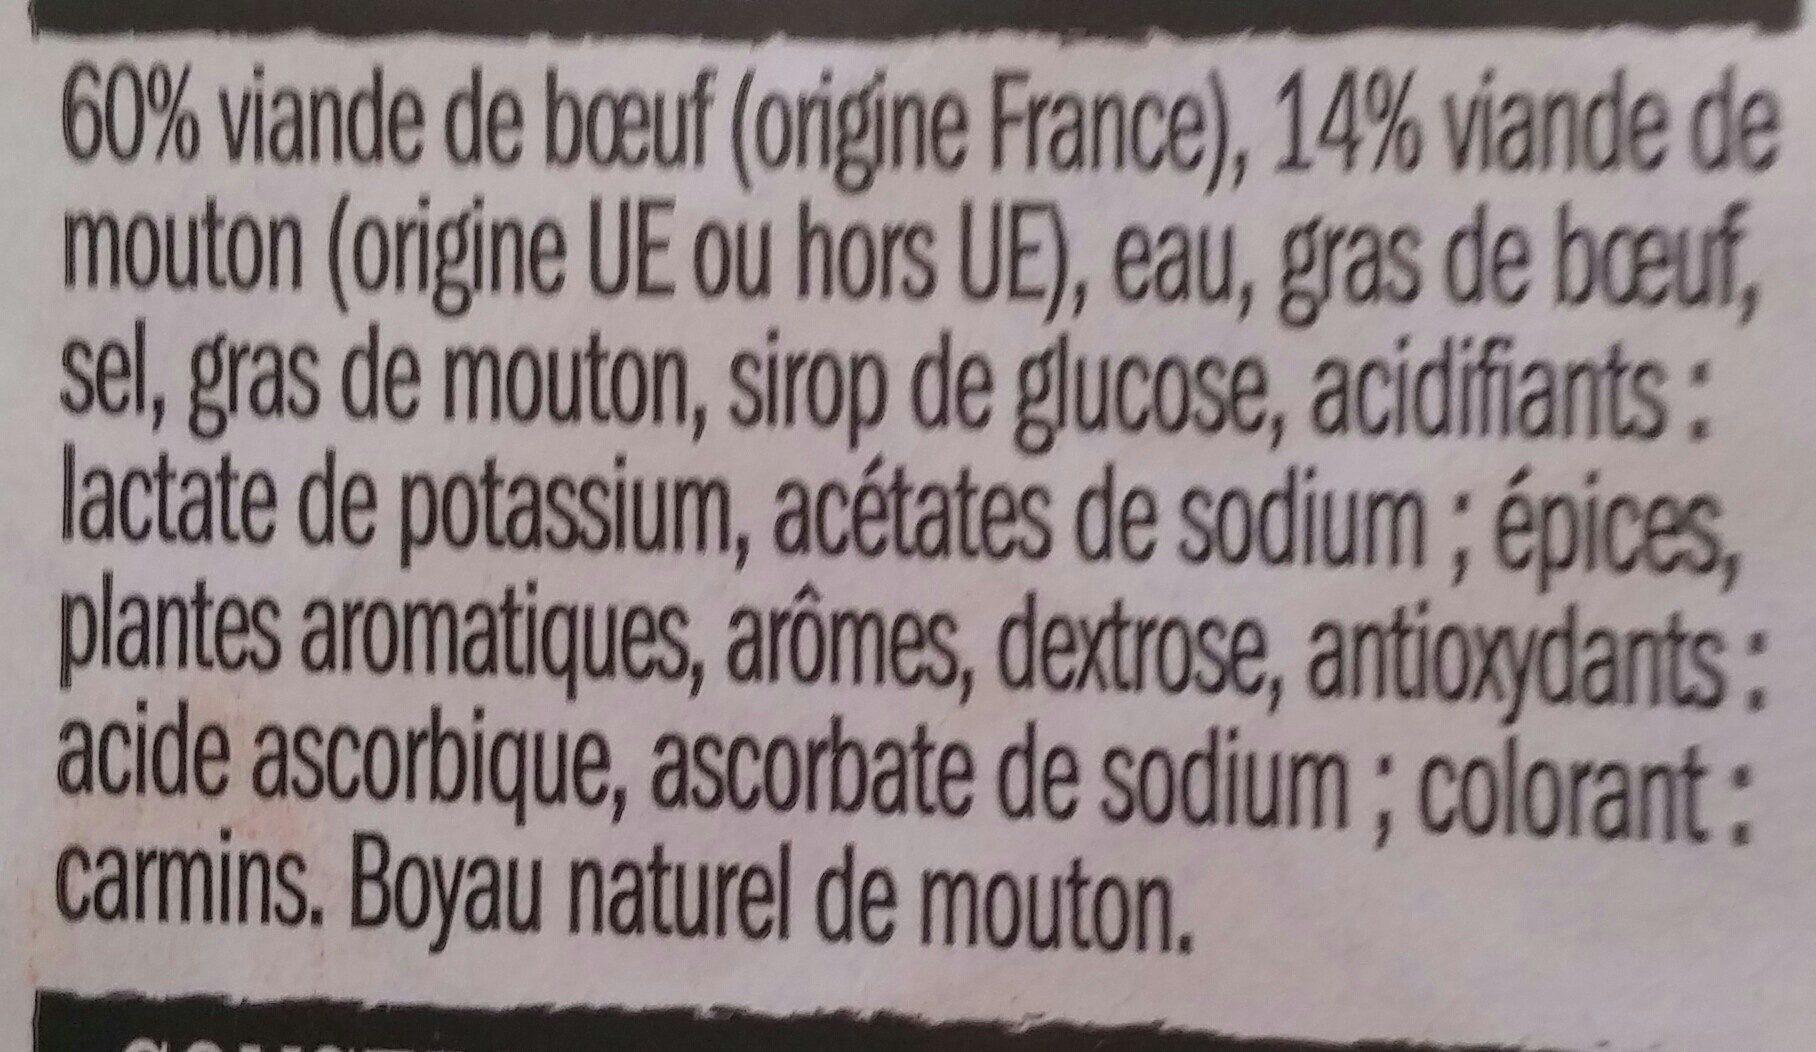 6 Merguez Véritables - Ingredients